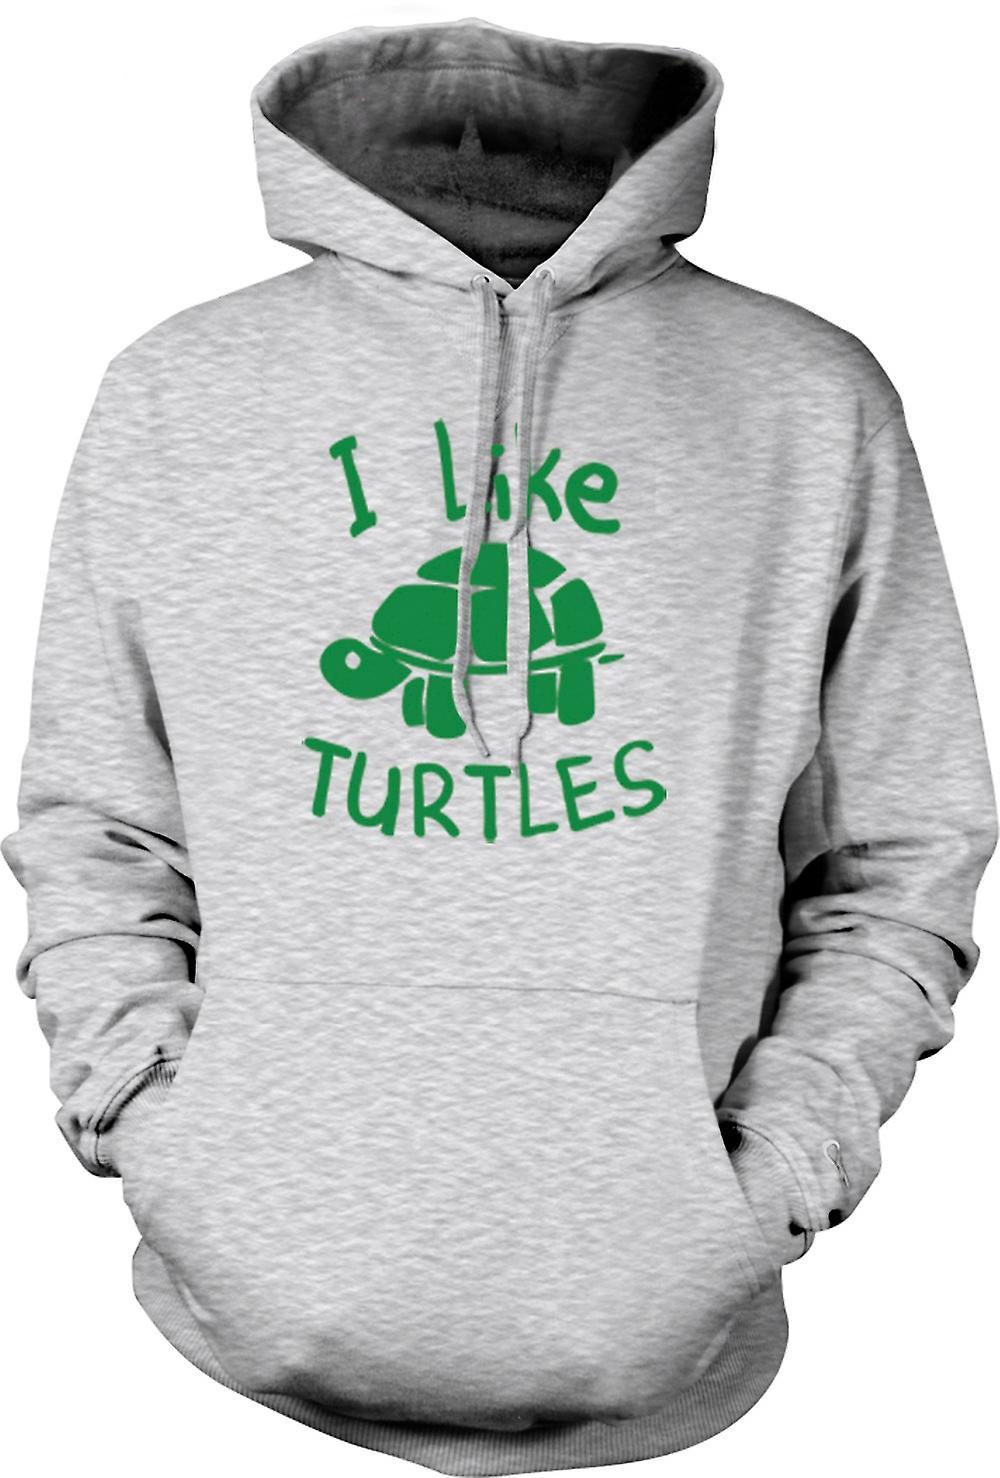 Mens Hoodie - I Like Turtles